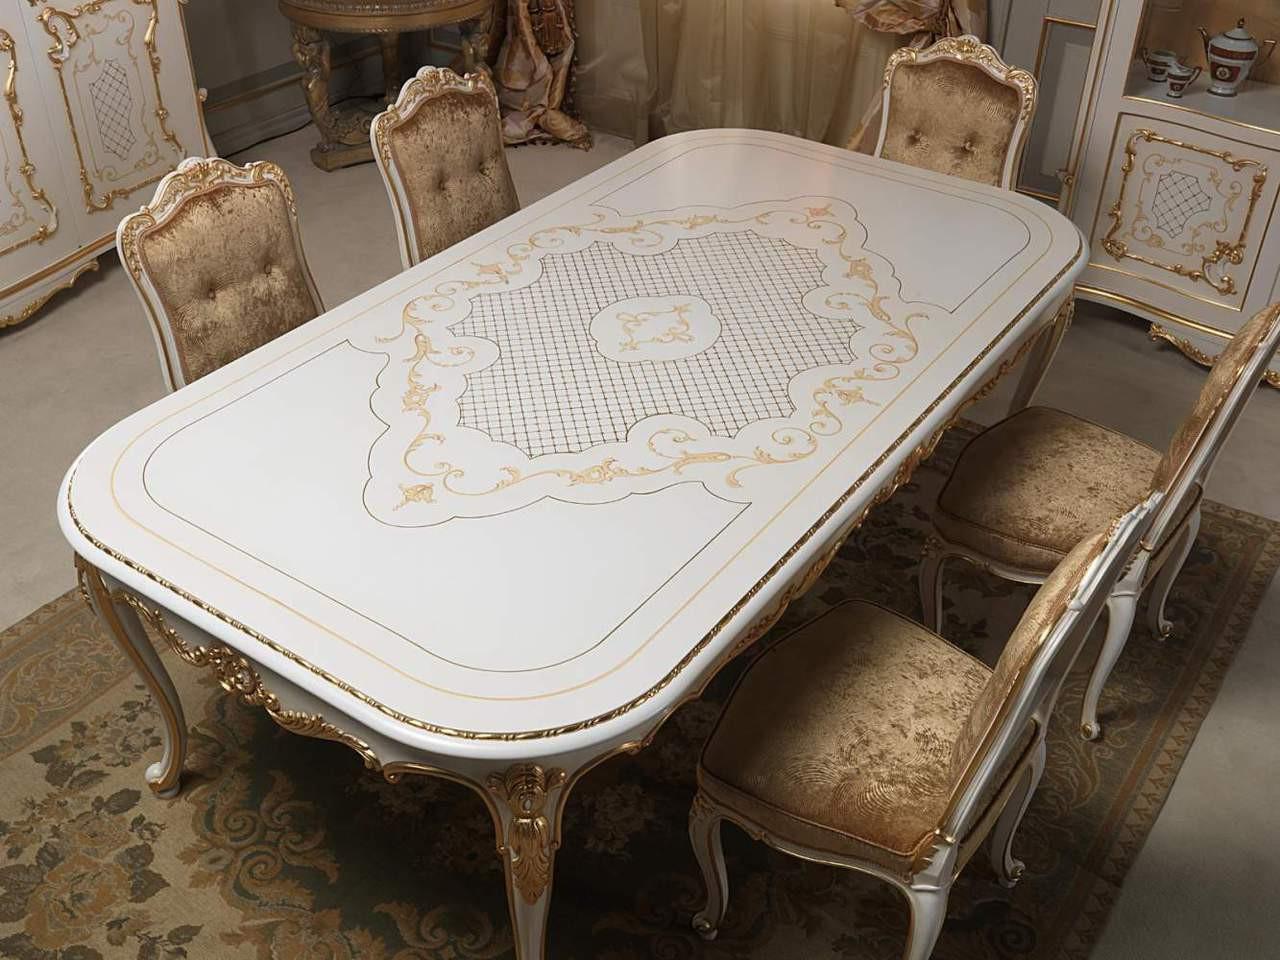 Dining Room Set White Gold Louis XVI Image 1 Loading Zoom